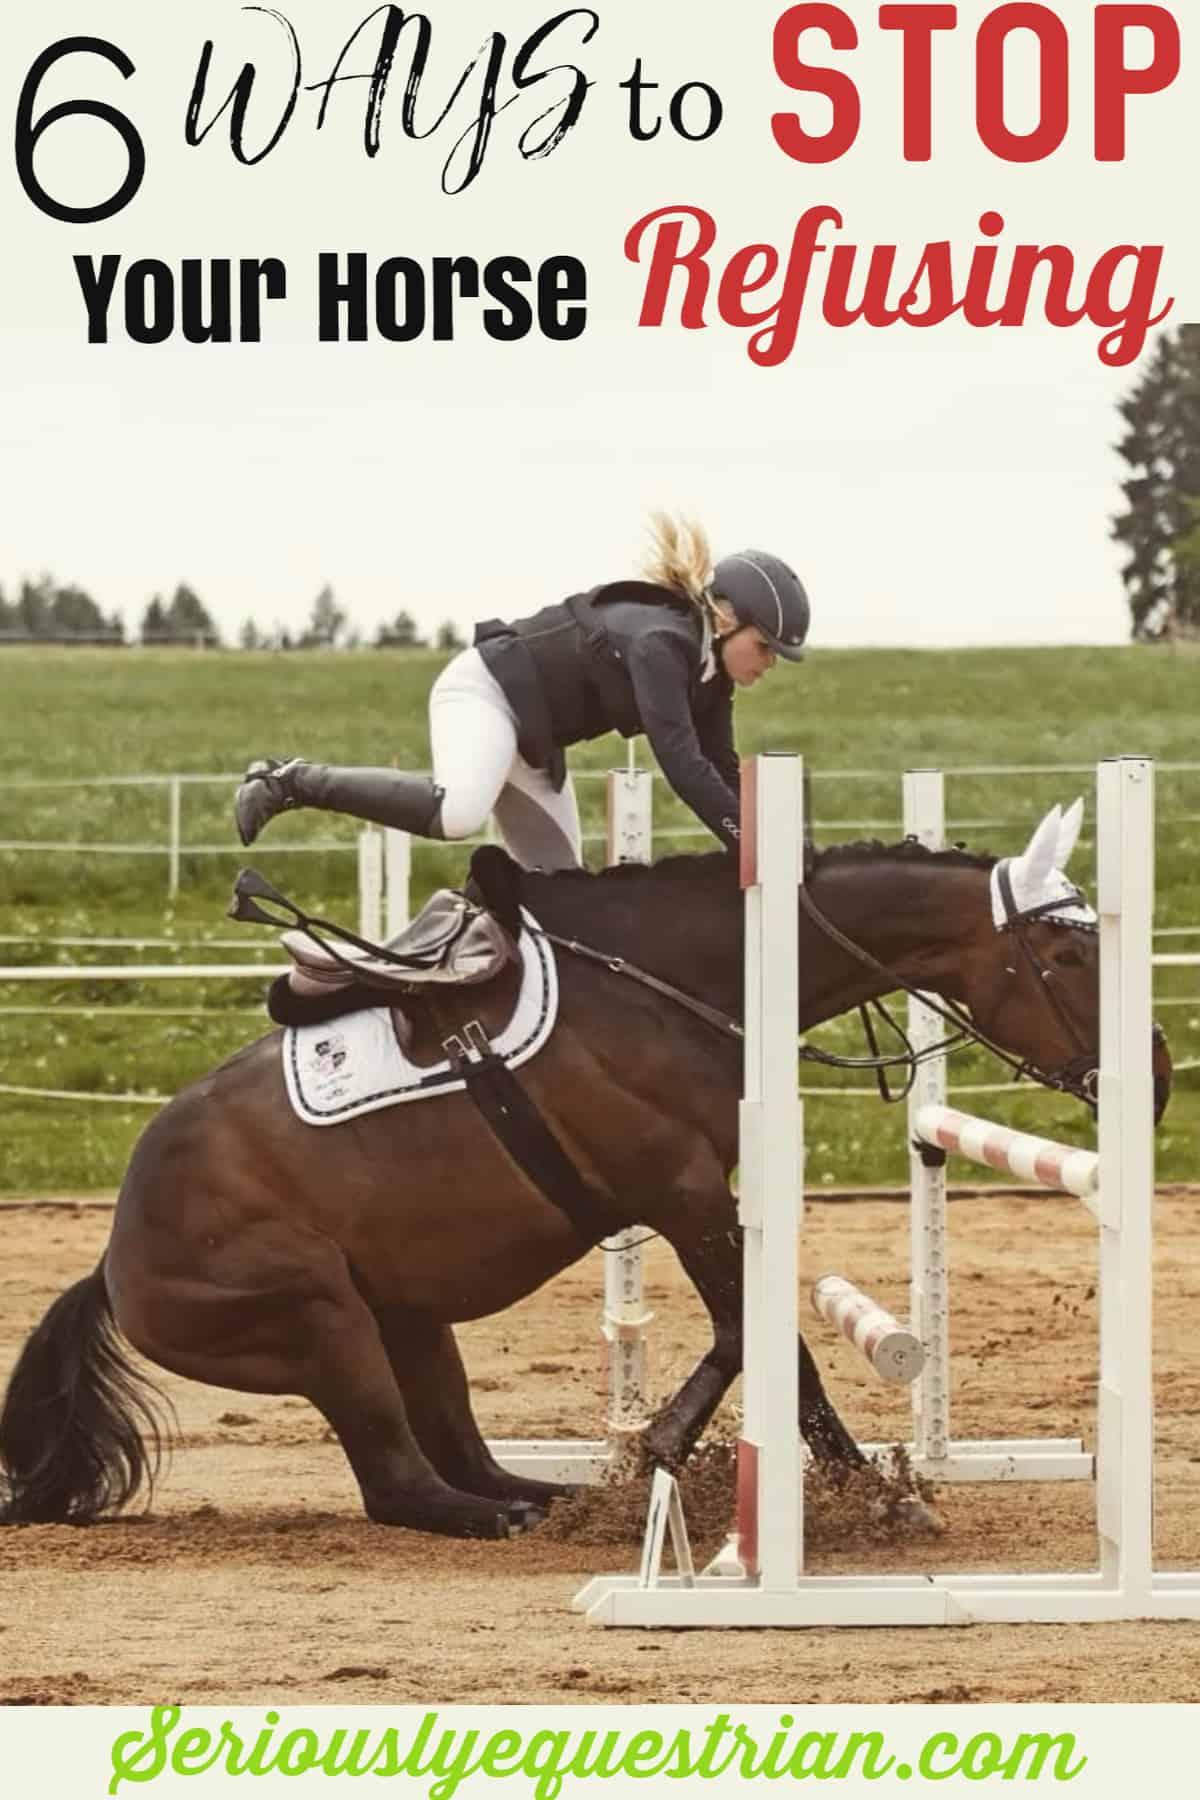 Horse refusal